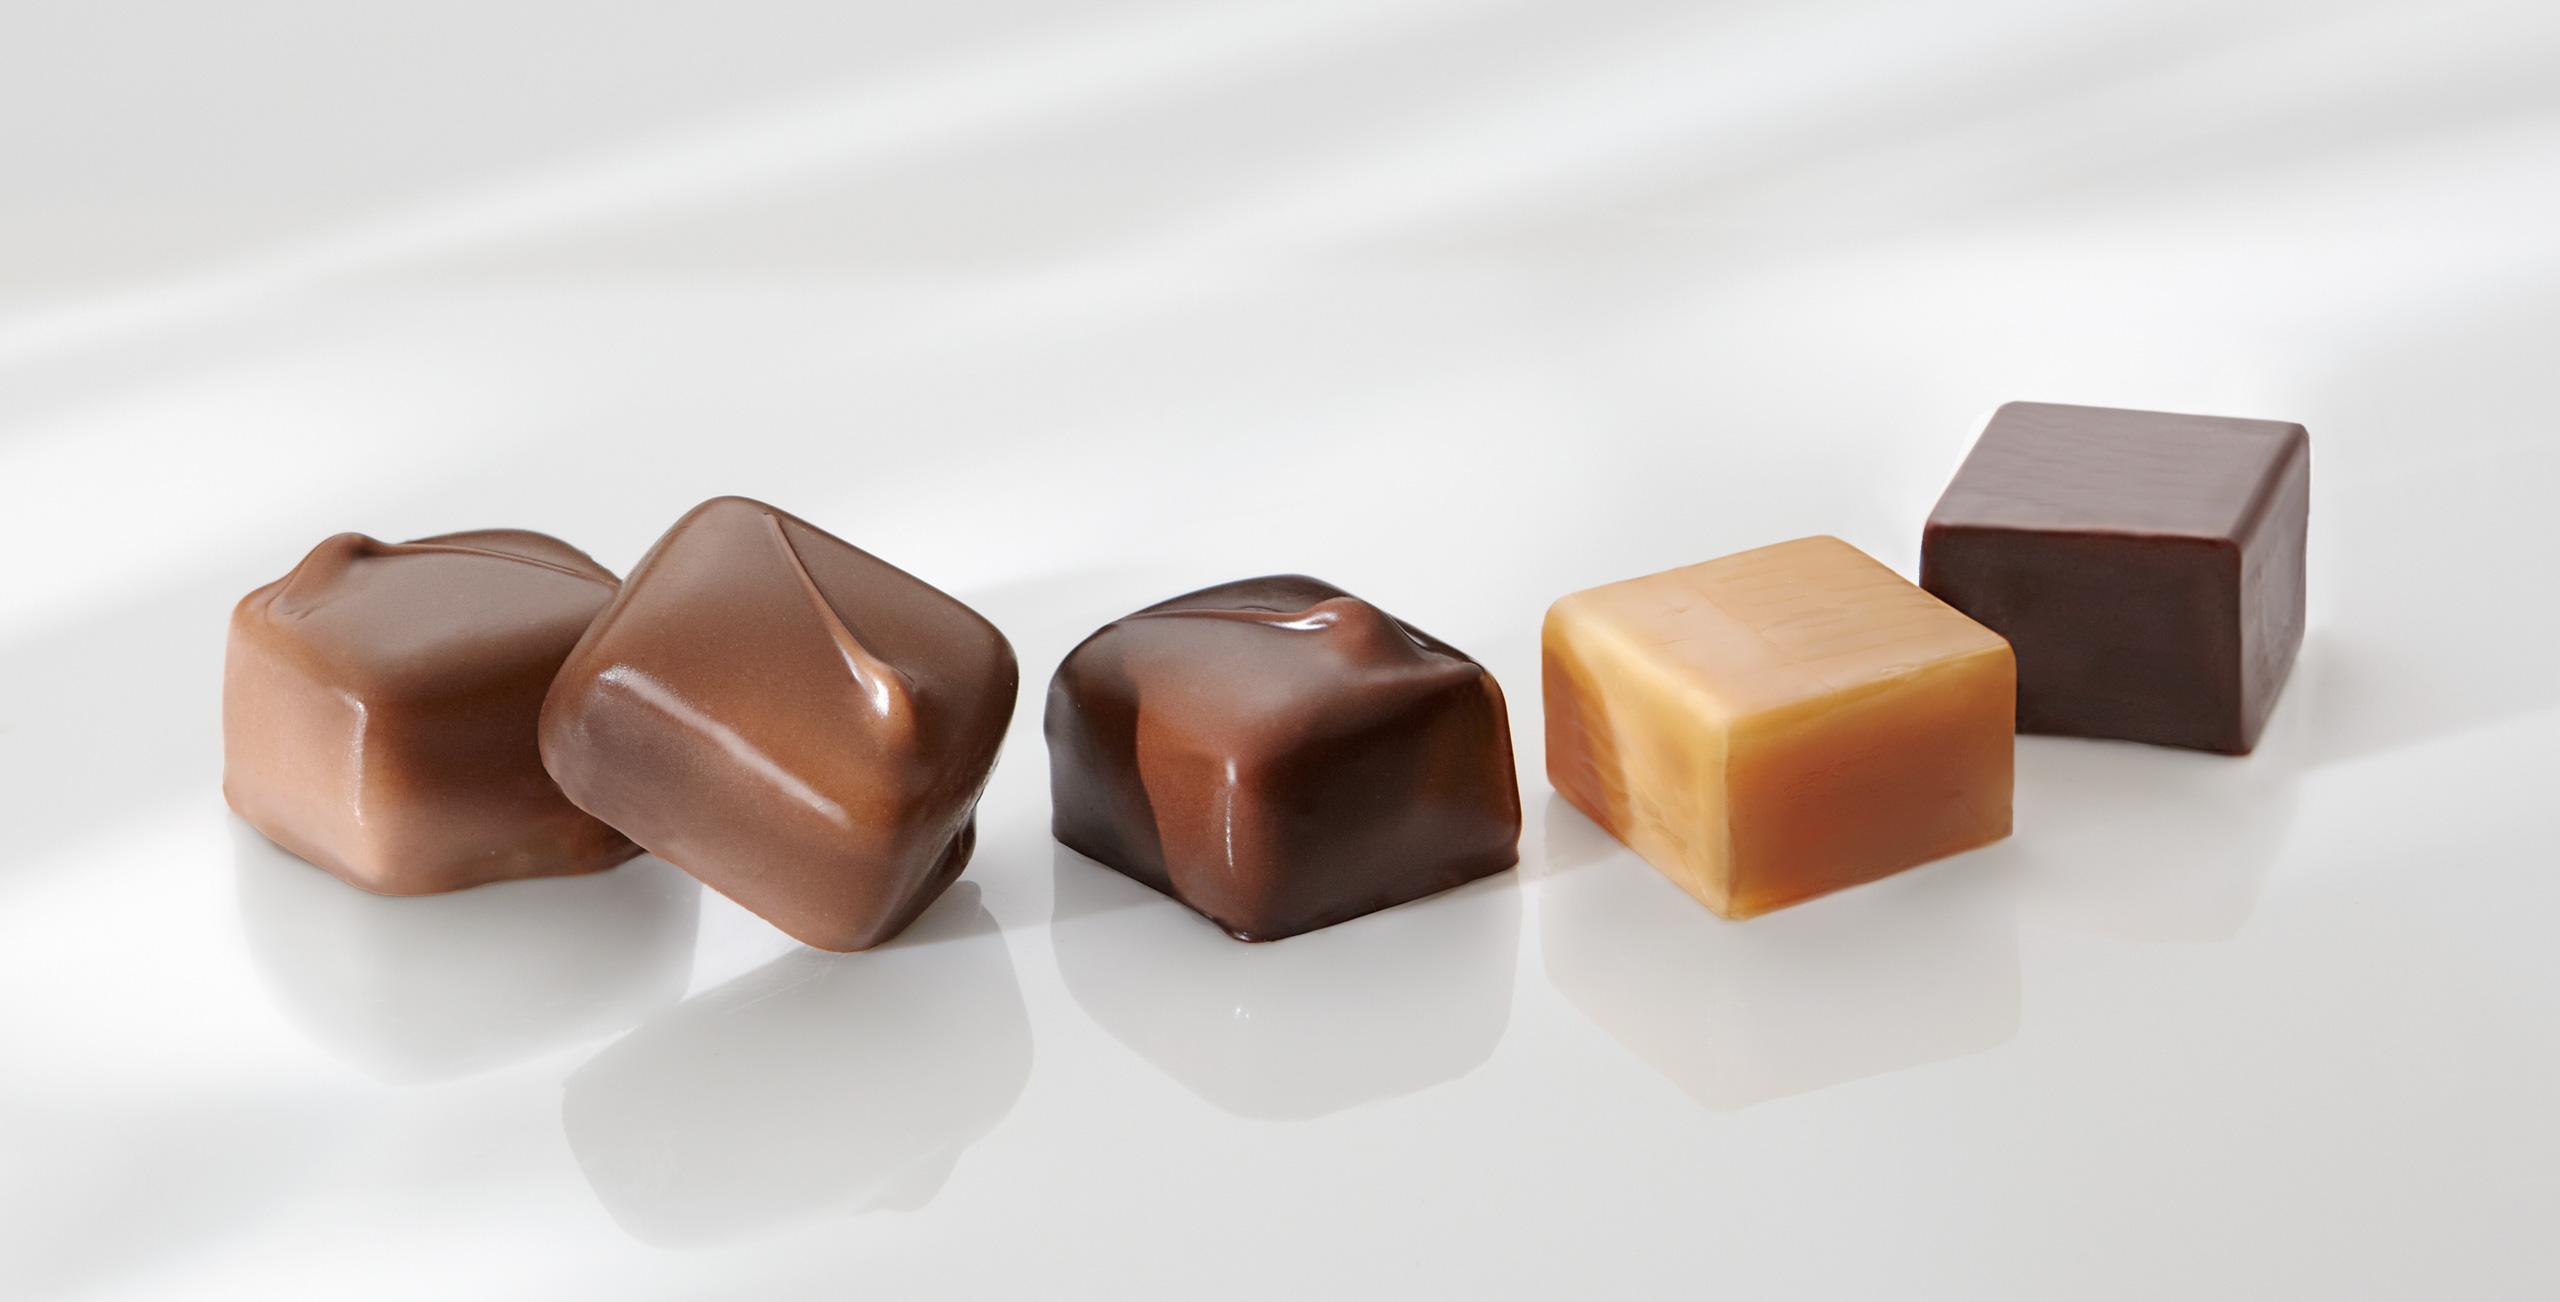 Monastery chocolates caramels food photography